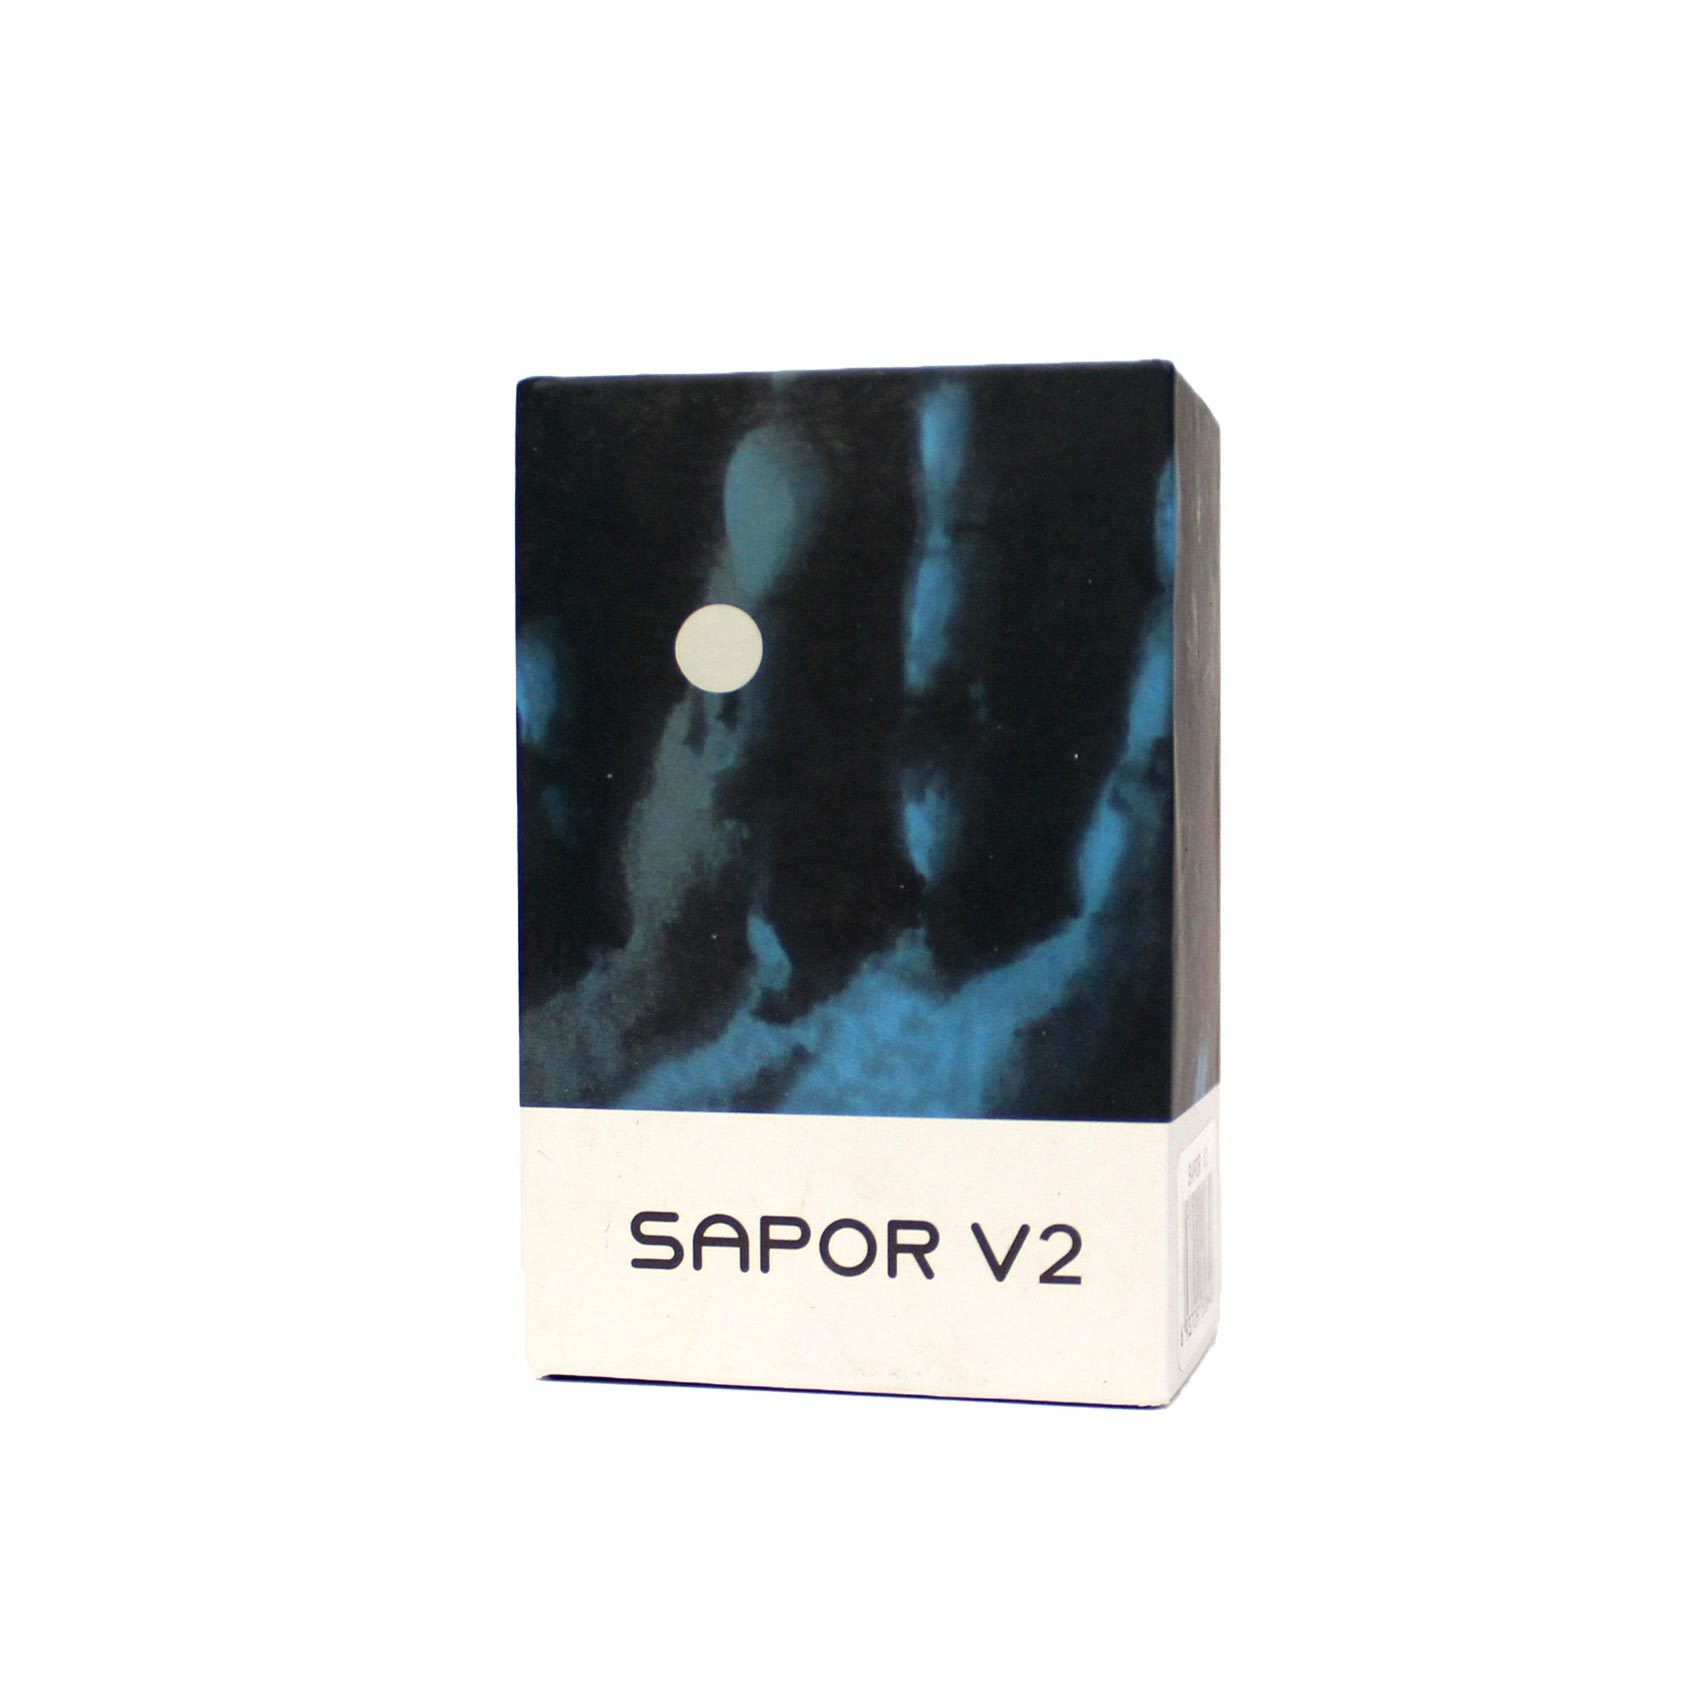 Дрипка Sapor V2 (Clone) коробка